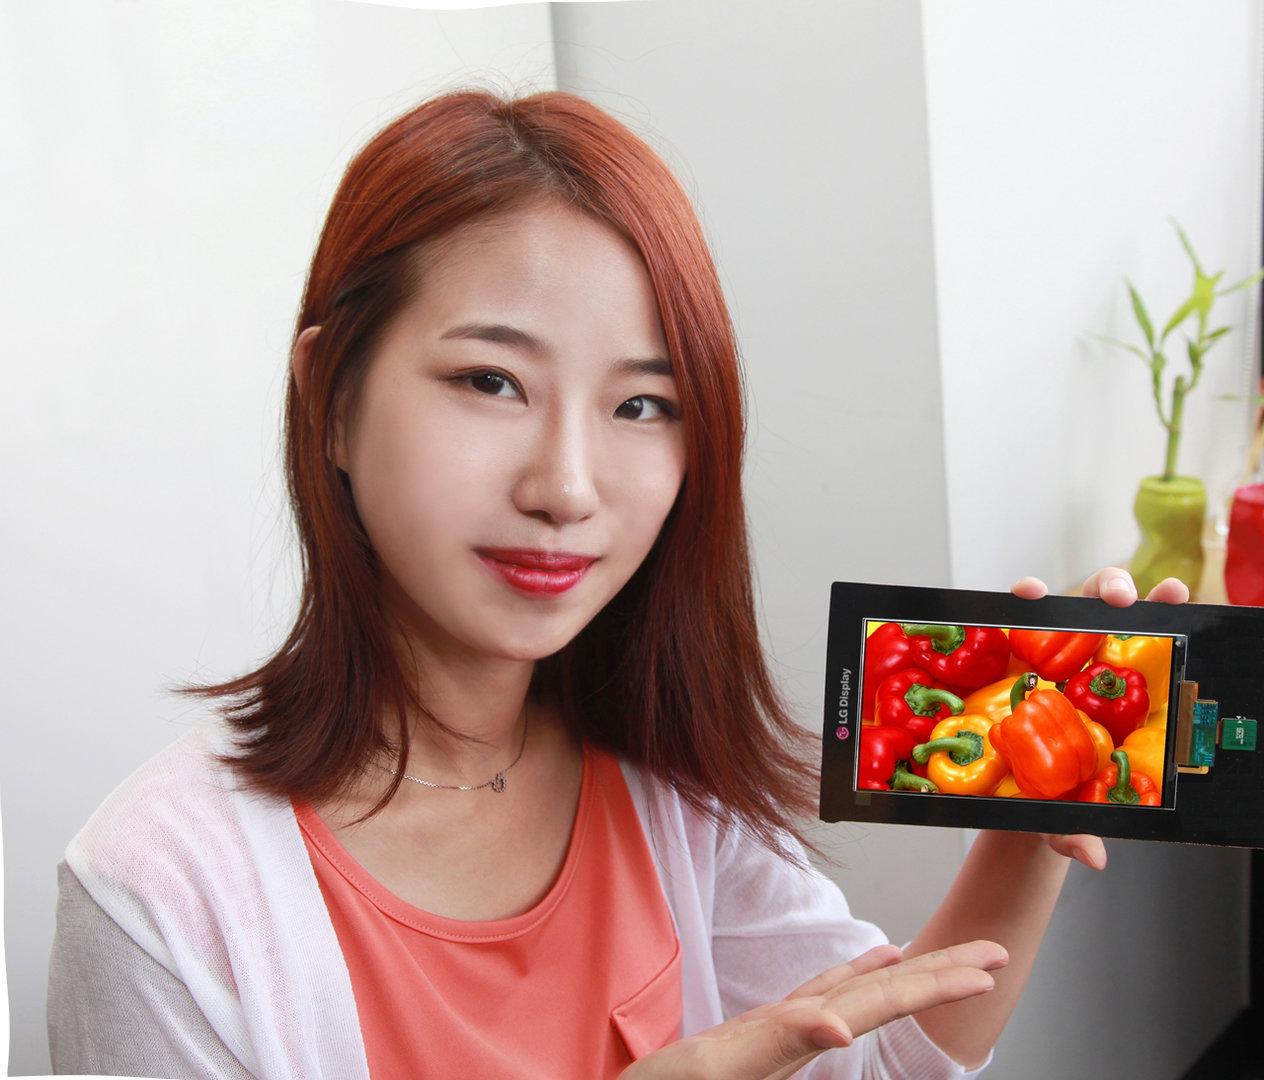 5,5 Zoll Display mit 2.560 × 1.440 Pixeln